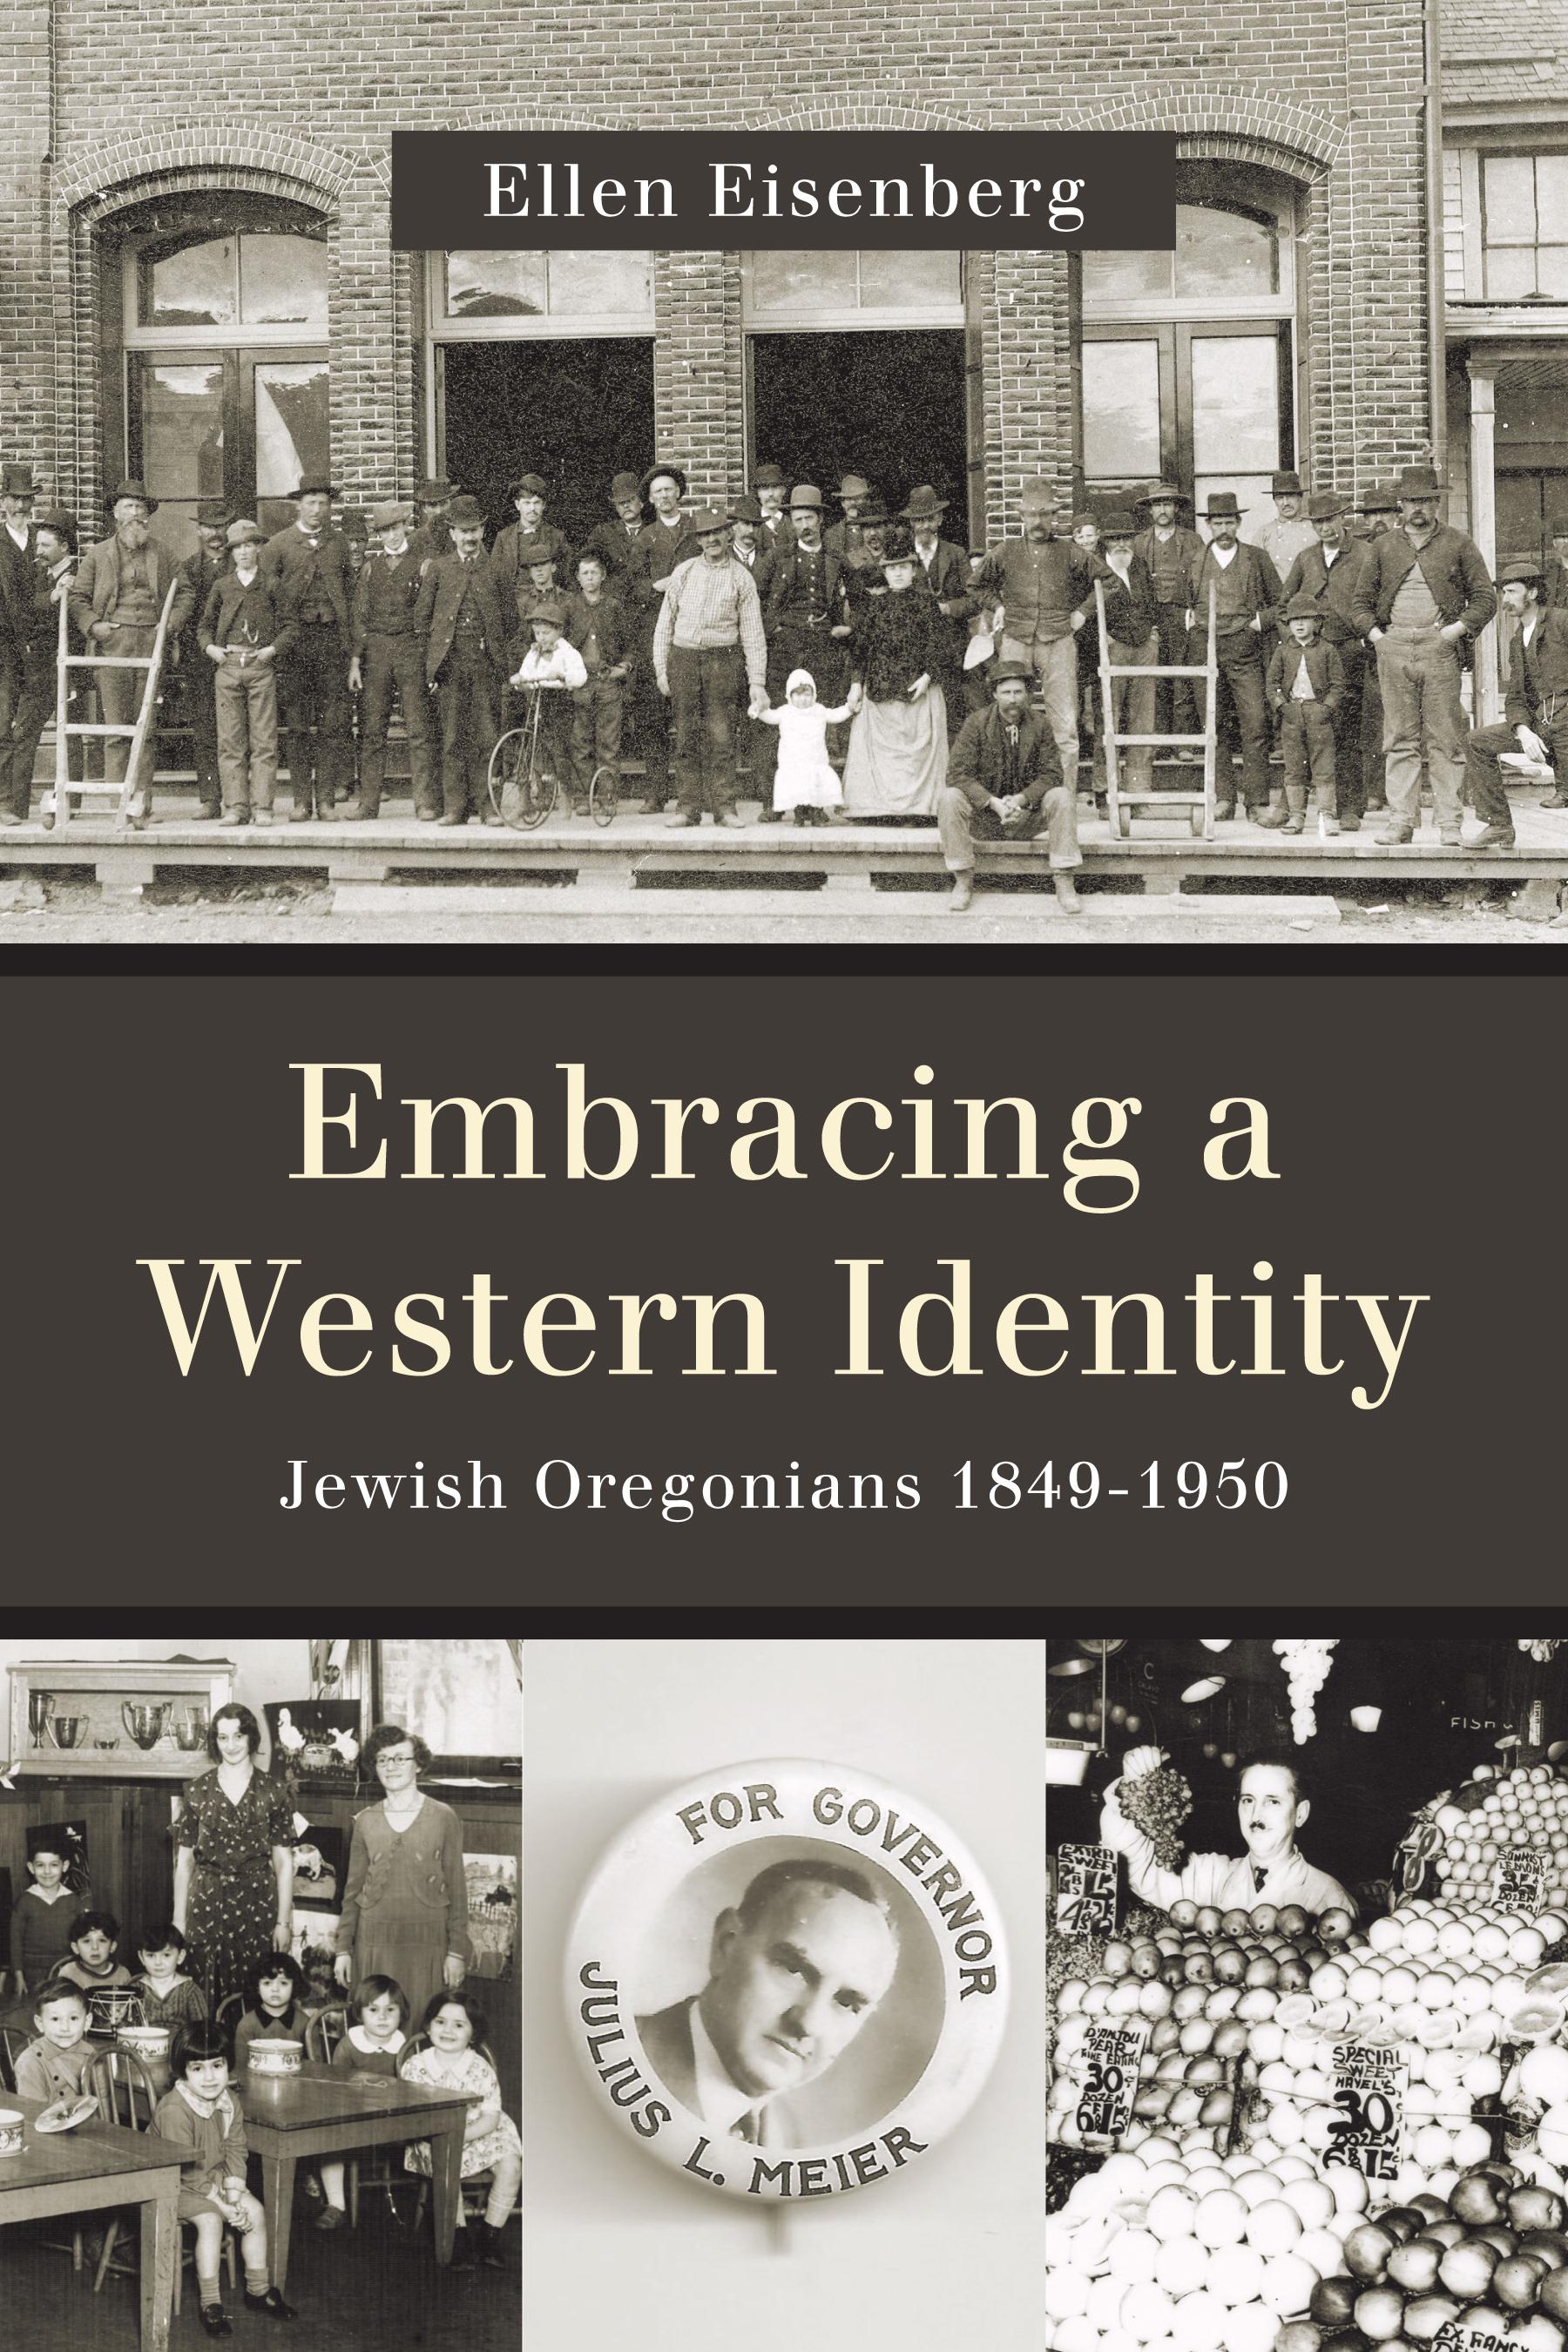 Embracing a Western Identity: Jewish Oregonians 1849-1950